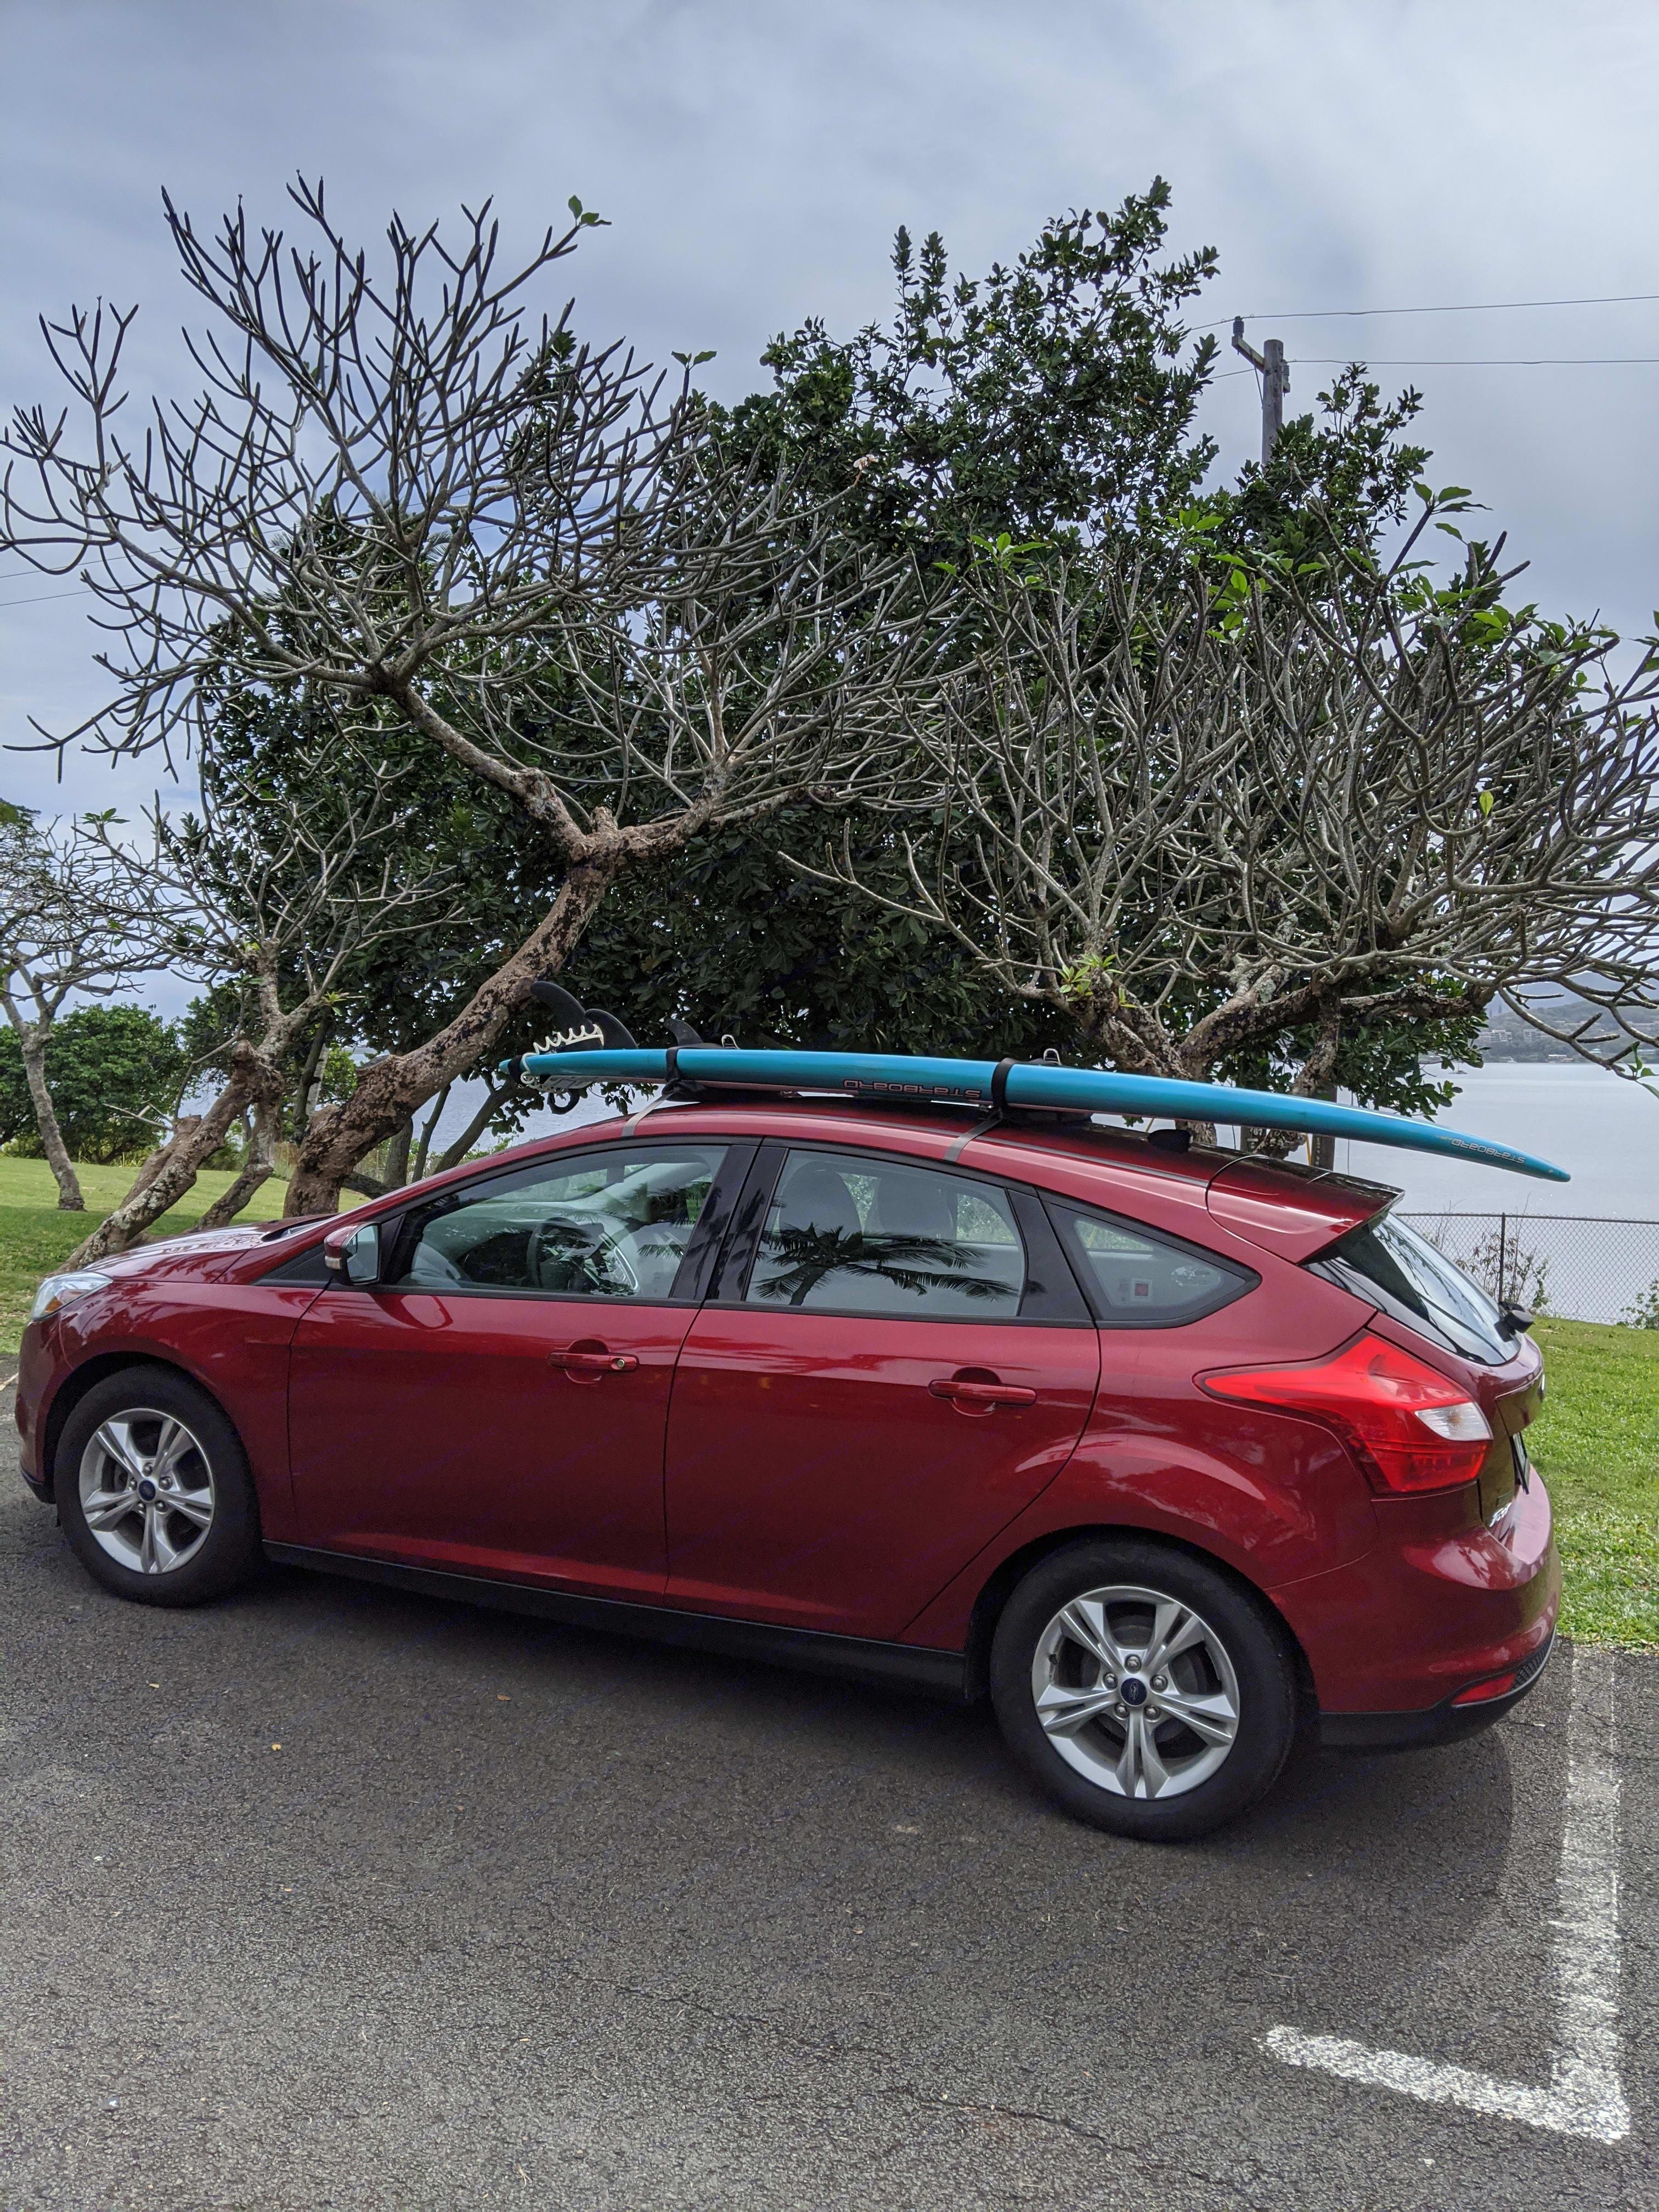 Optional surfboard rack add-on. Ford Focus 2013